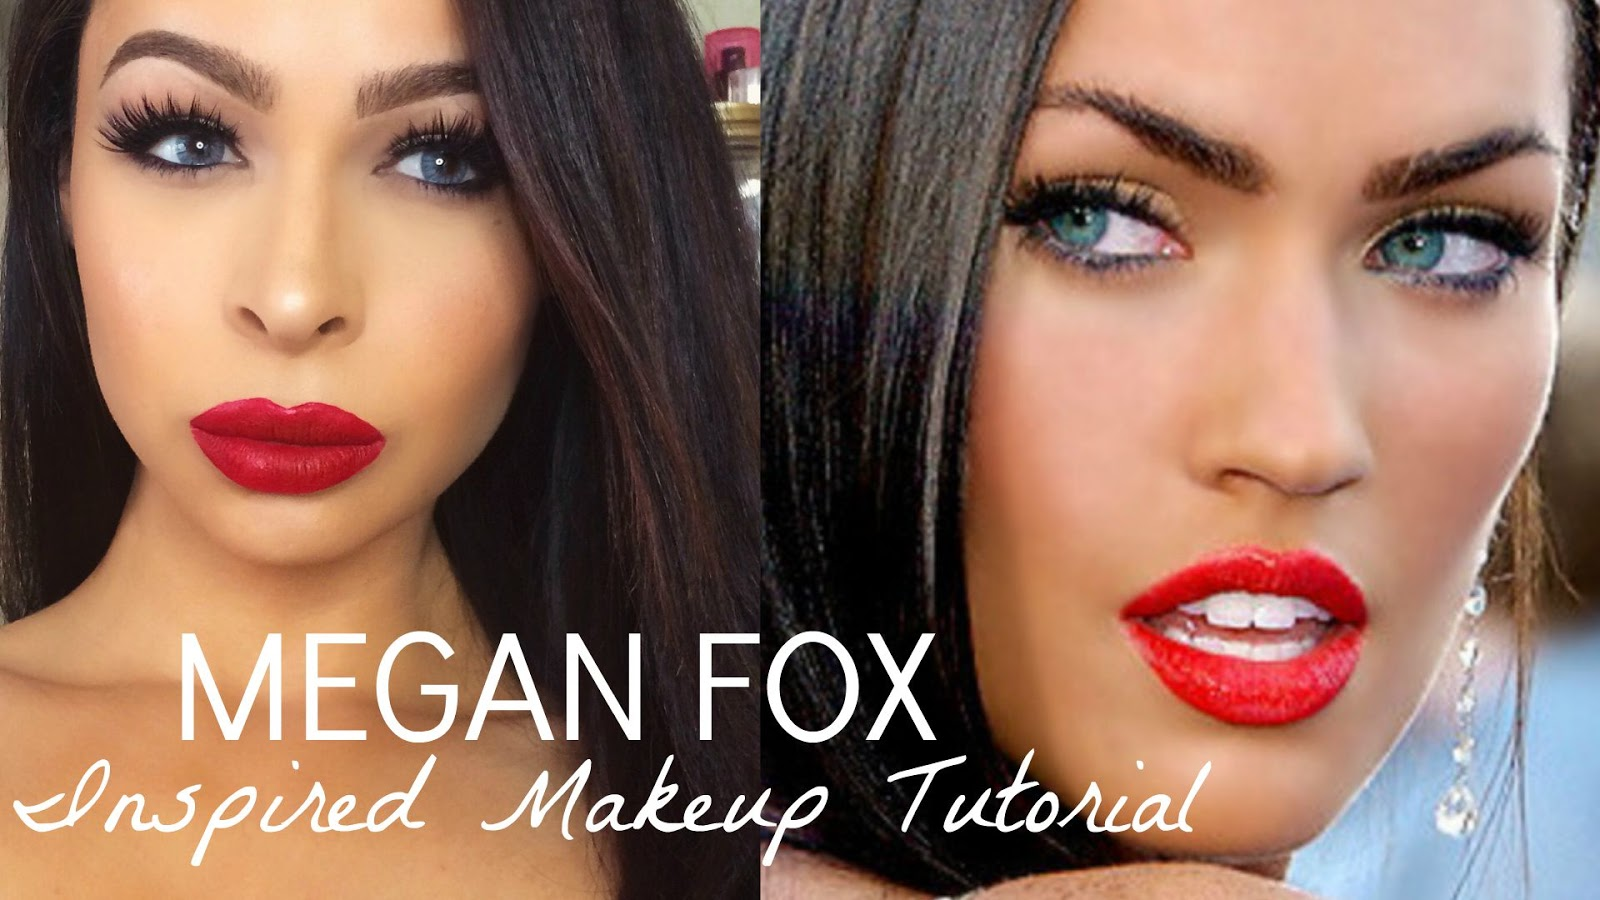 Krystal allen beauty celebrity inspired makeup tutorial megan fox celebrity inspired makeup tutorial megan fox baditri Images